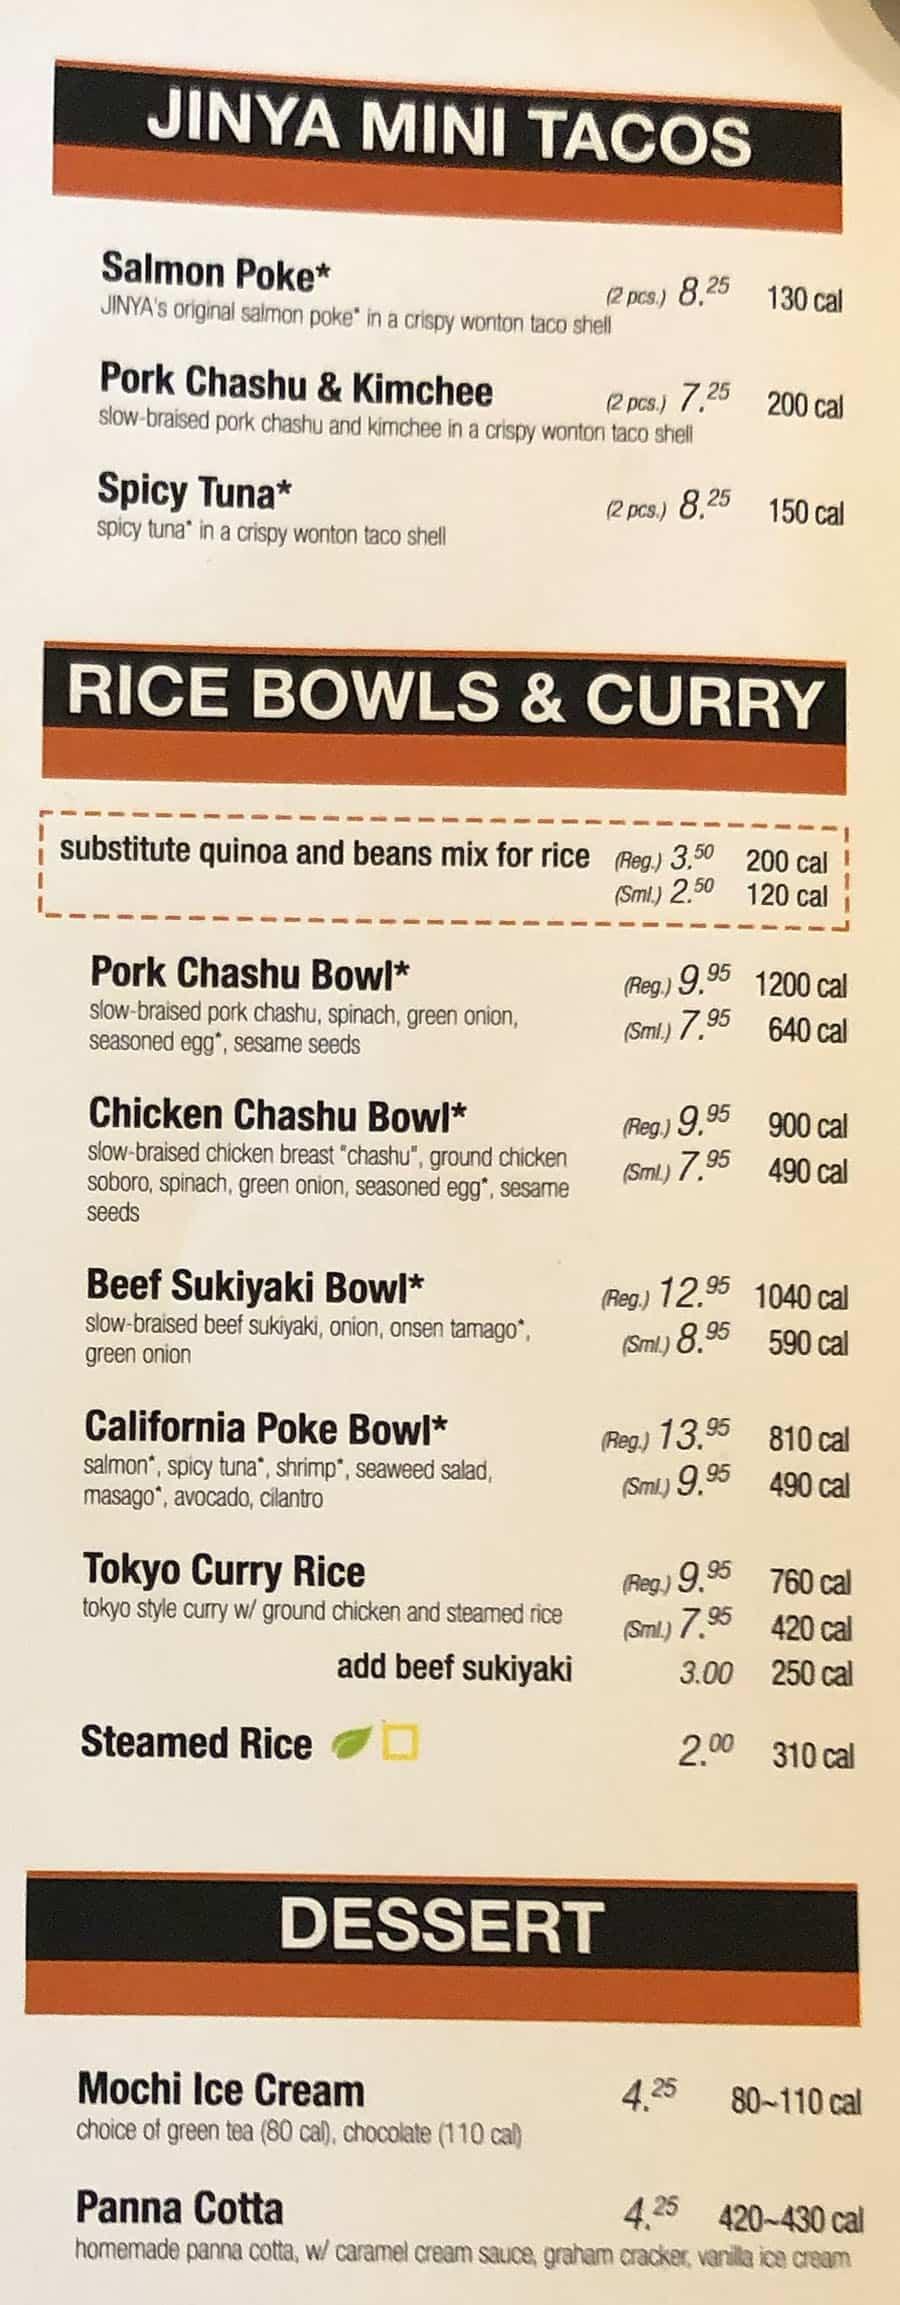 JINYA Ramen Bar menu - tacos, rice bowls, dessert